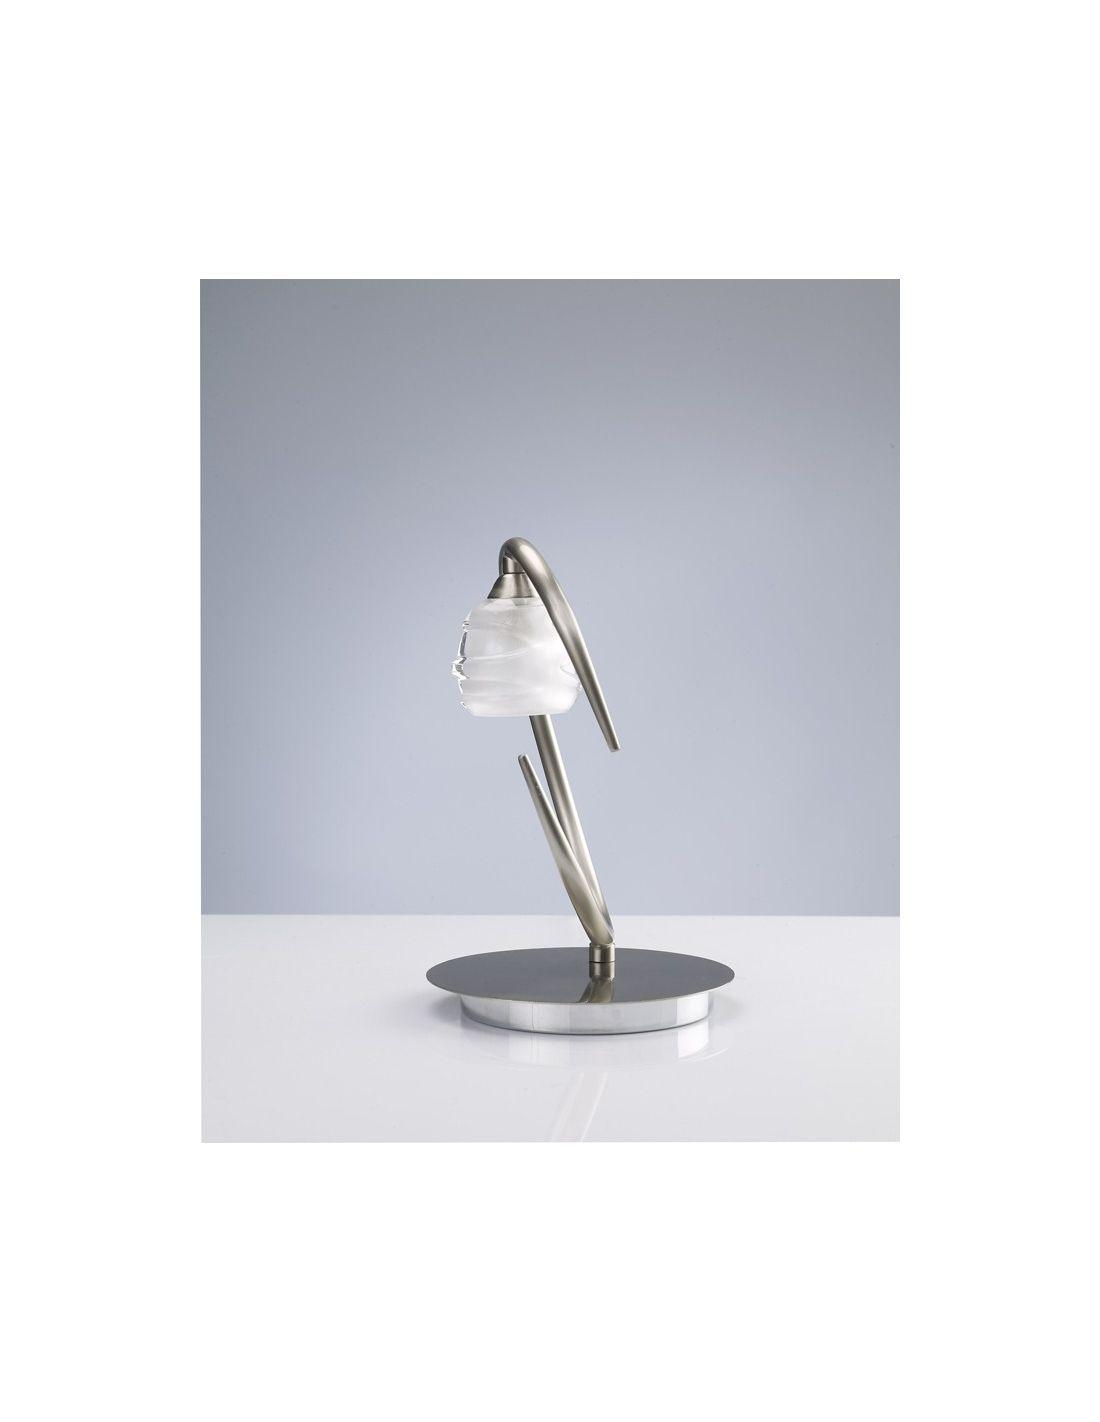 lamparas de mesa economicas, lamparas de mesa ofertas, lamparas mesa ...